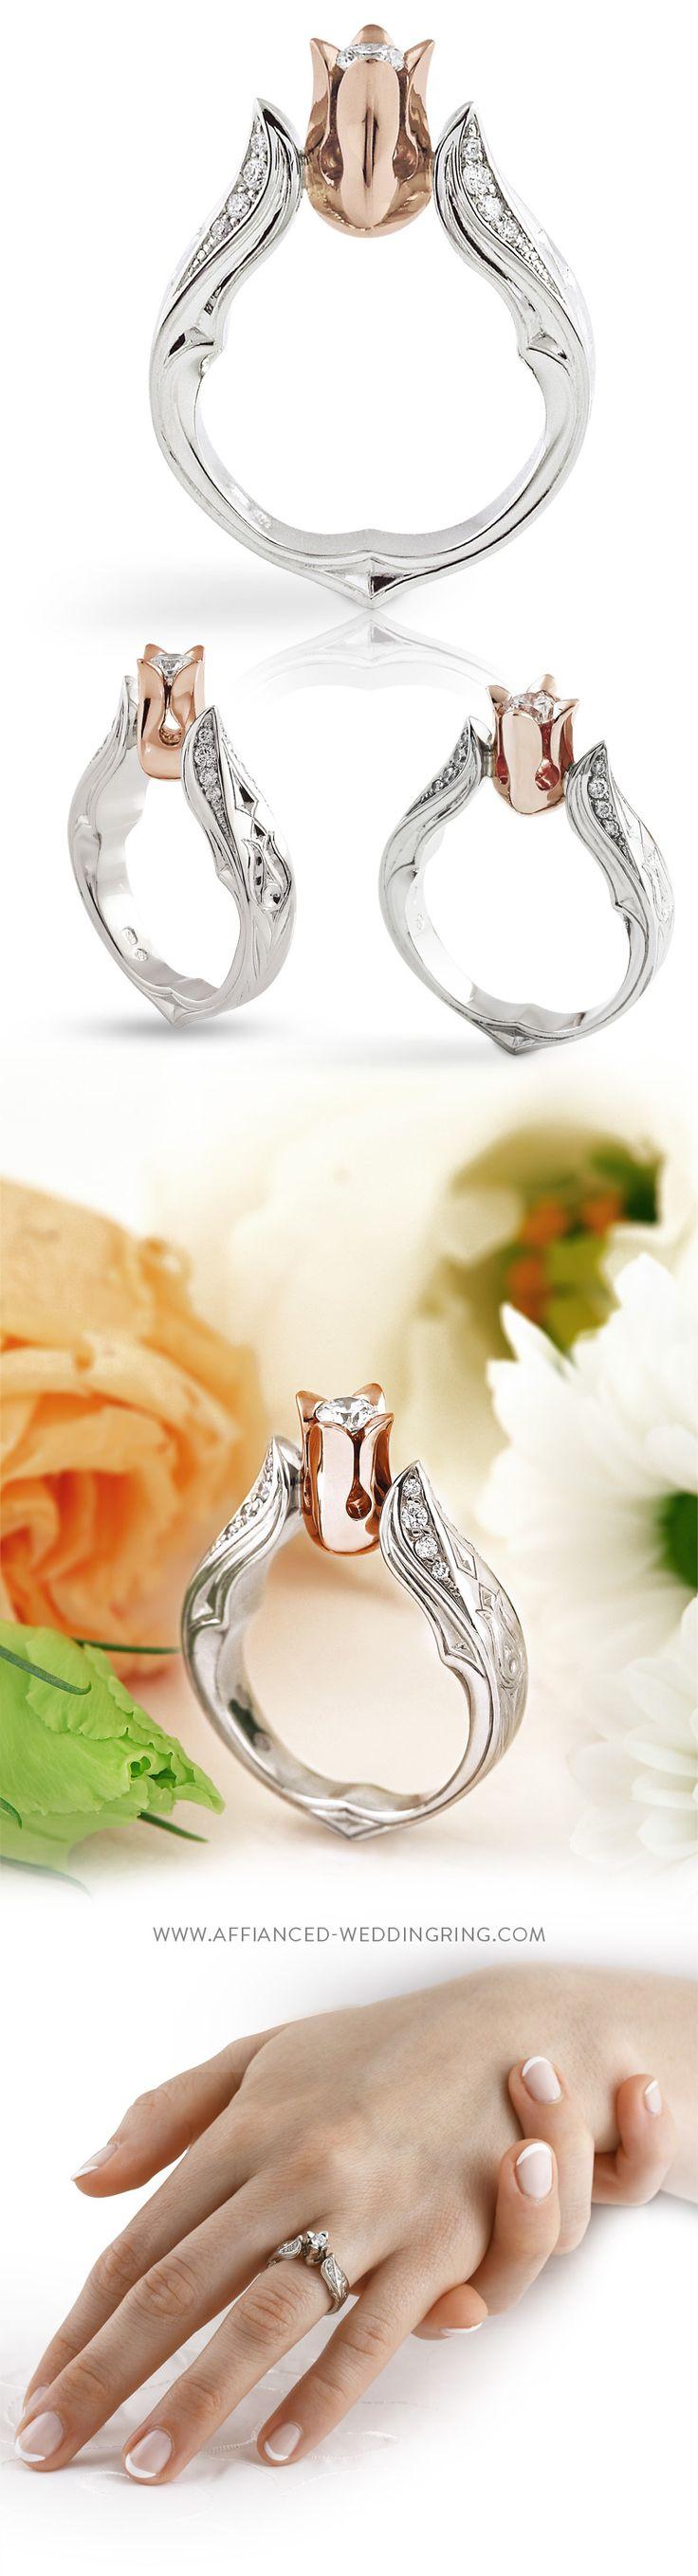 jewelry owl wedding ring Wedding rings for women